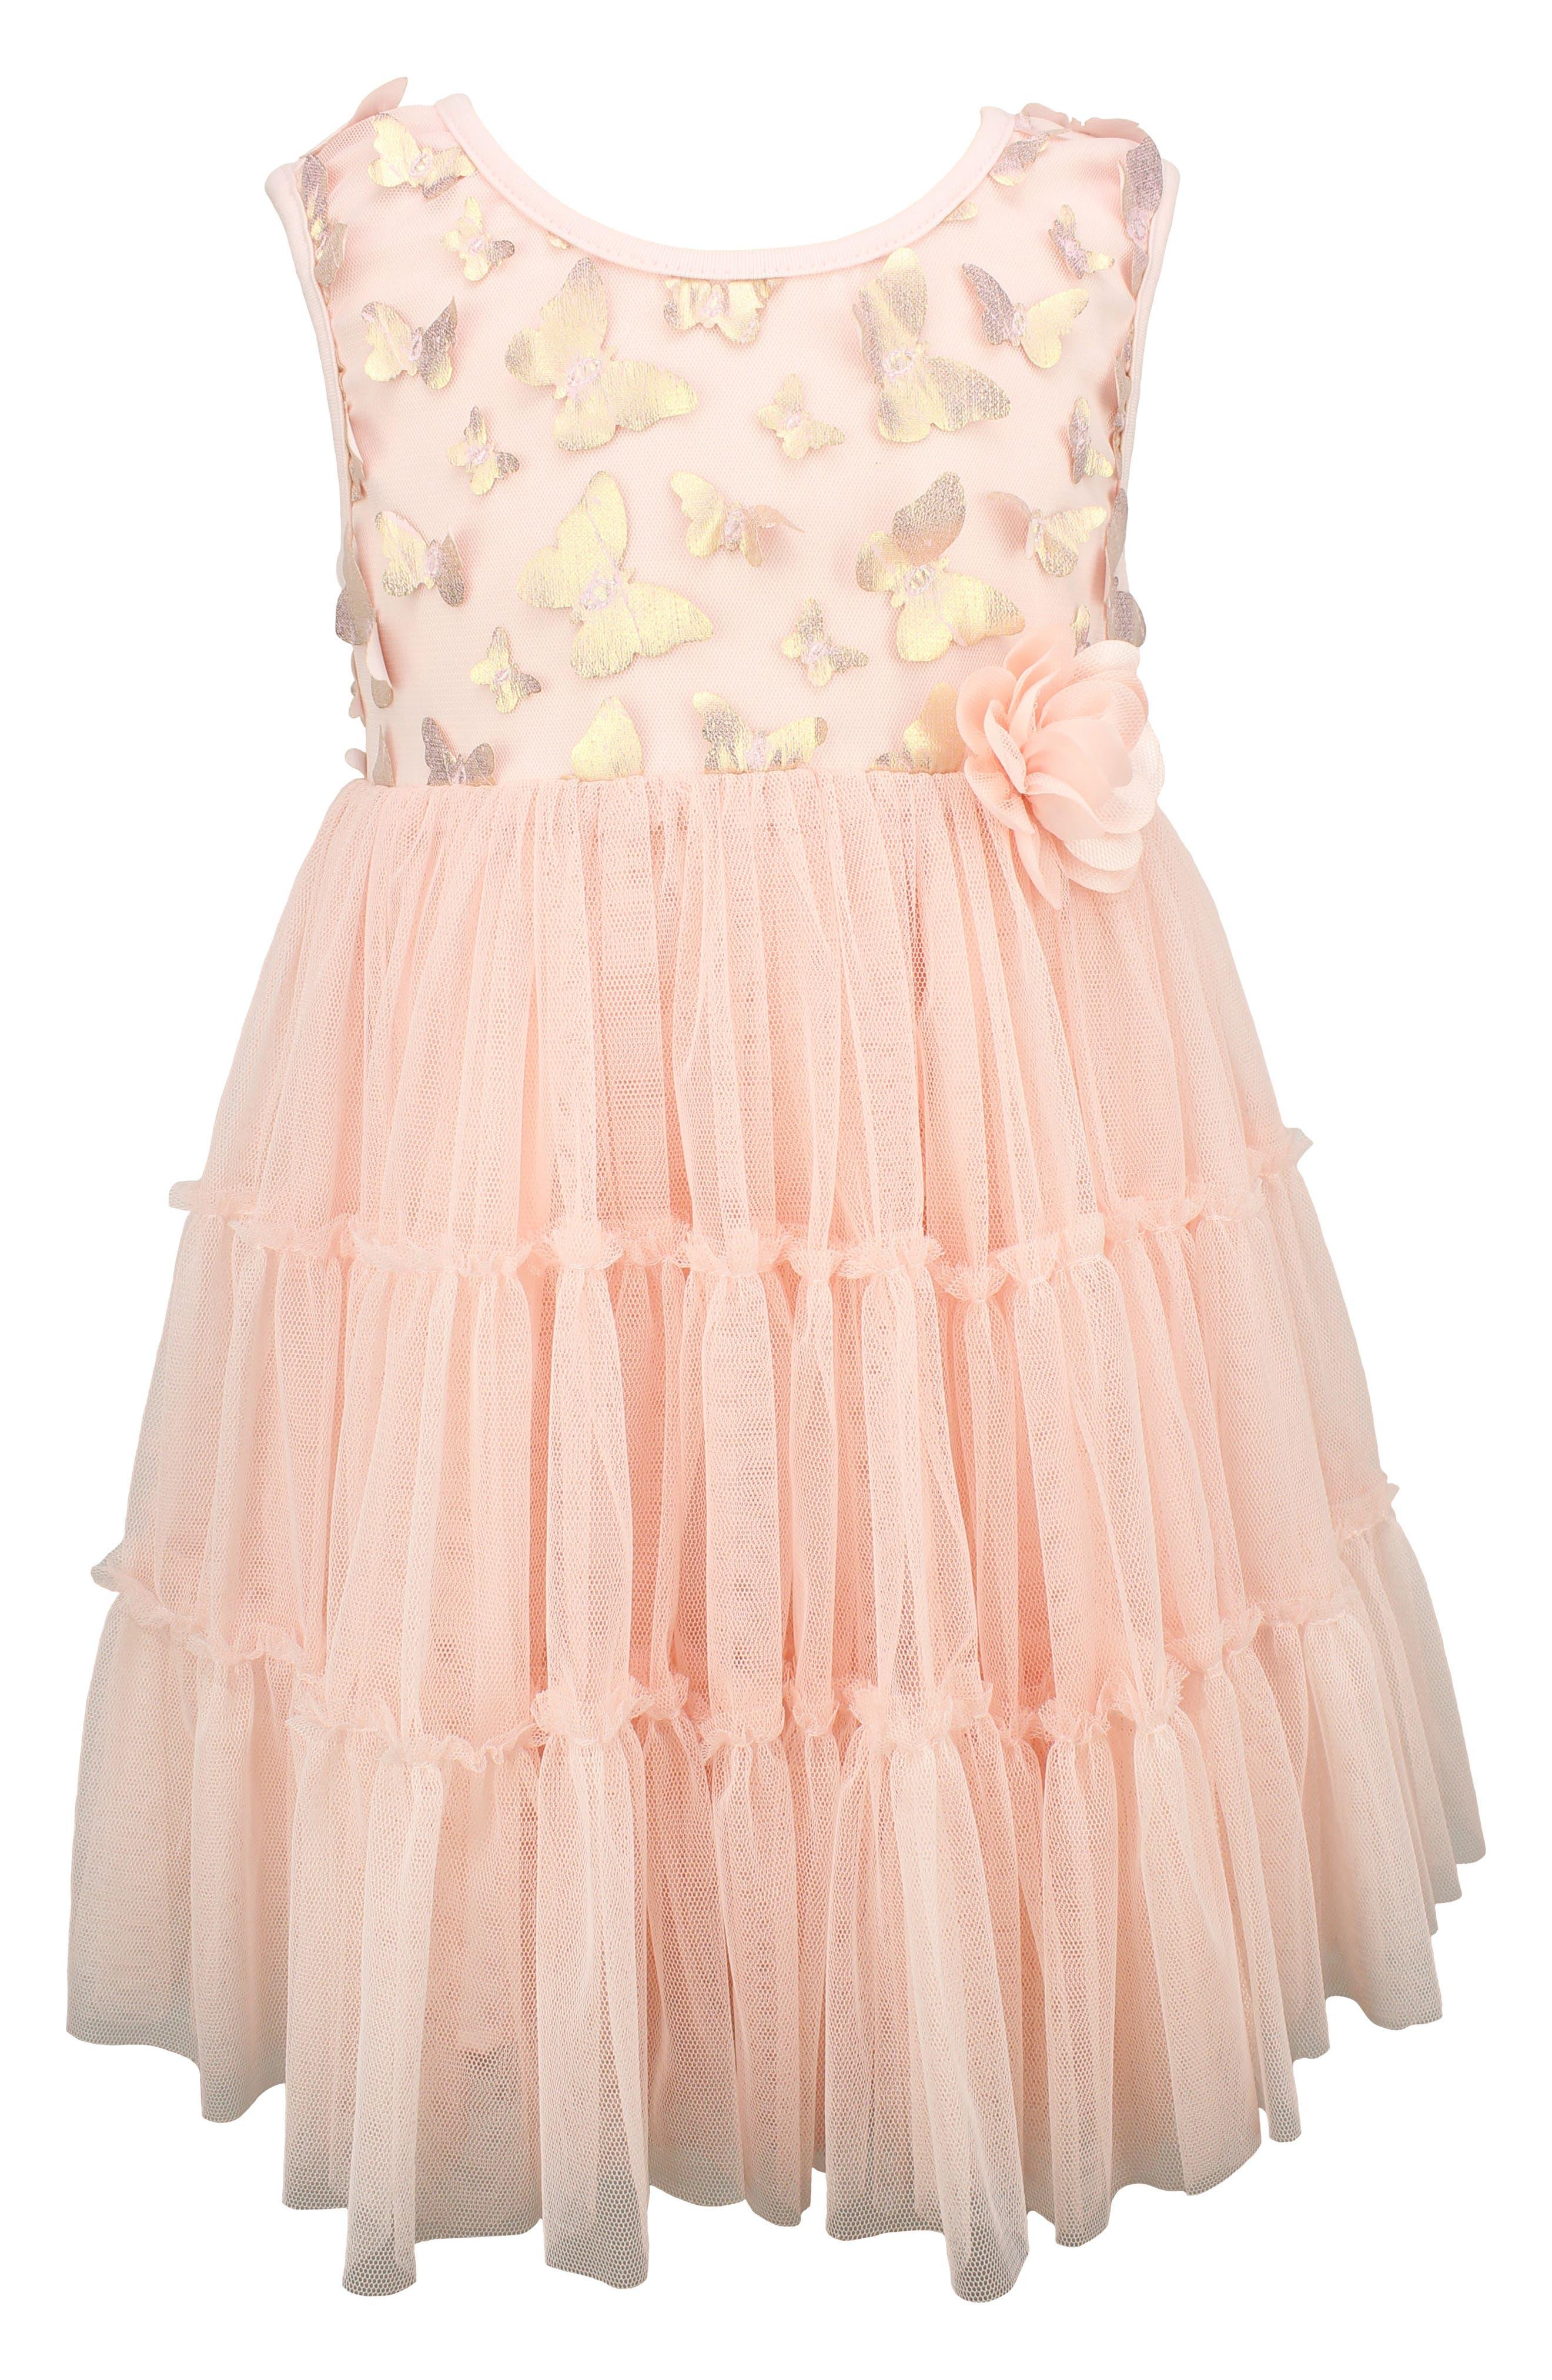 POPATU, Metallic Butterfly Tulle Dress, Main thumbnail 1, color, DUSTY PINK